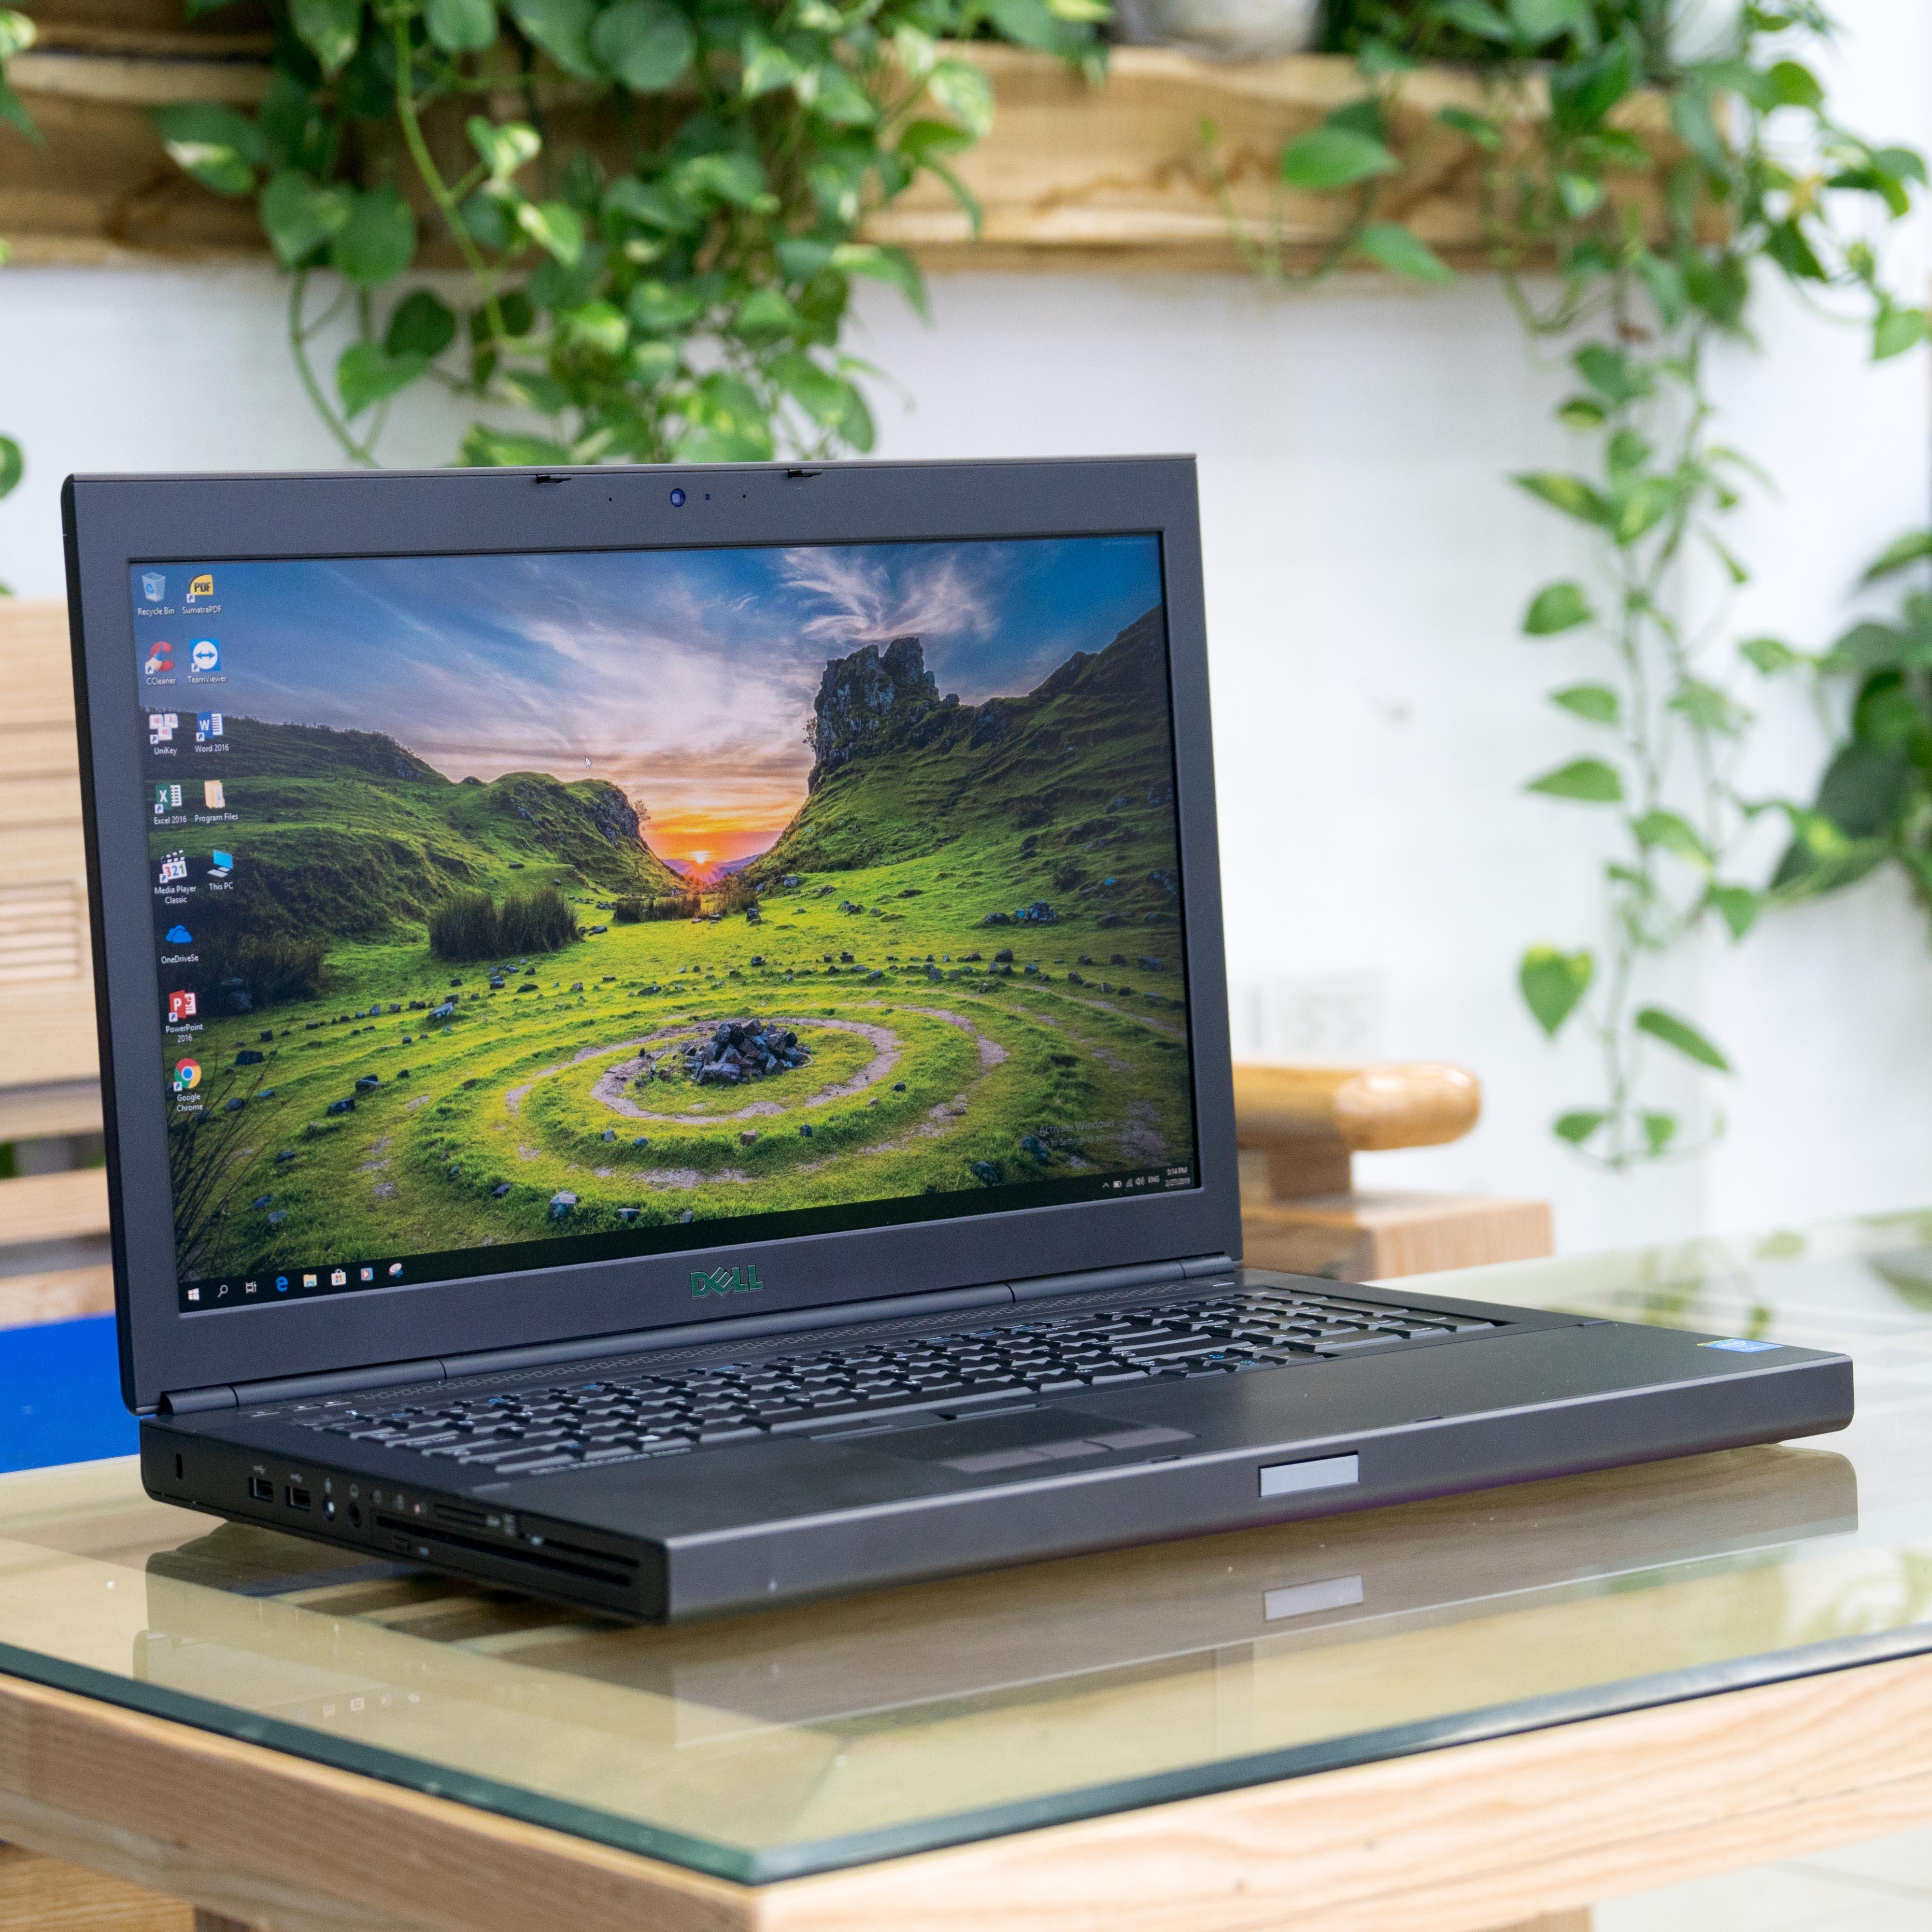 laptop tcc Dell Precision M6800 (4)